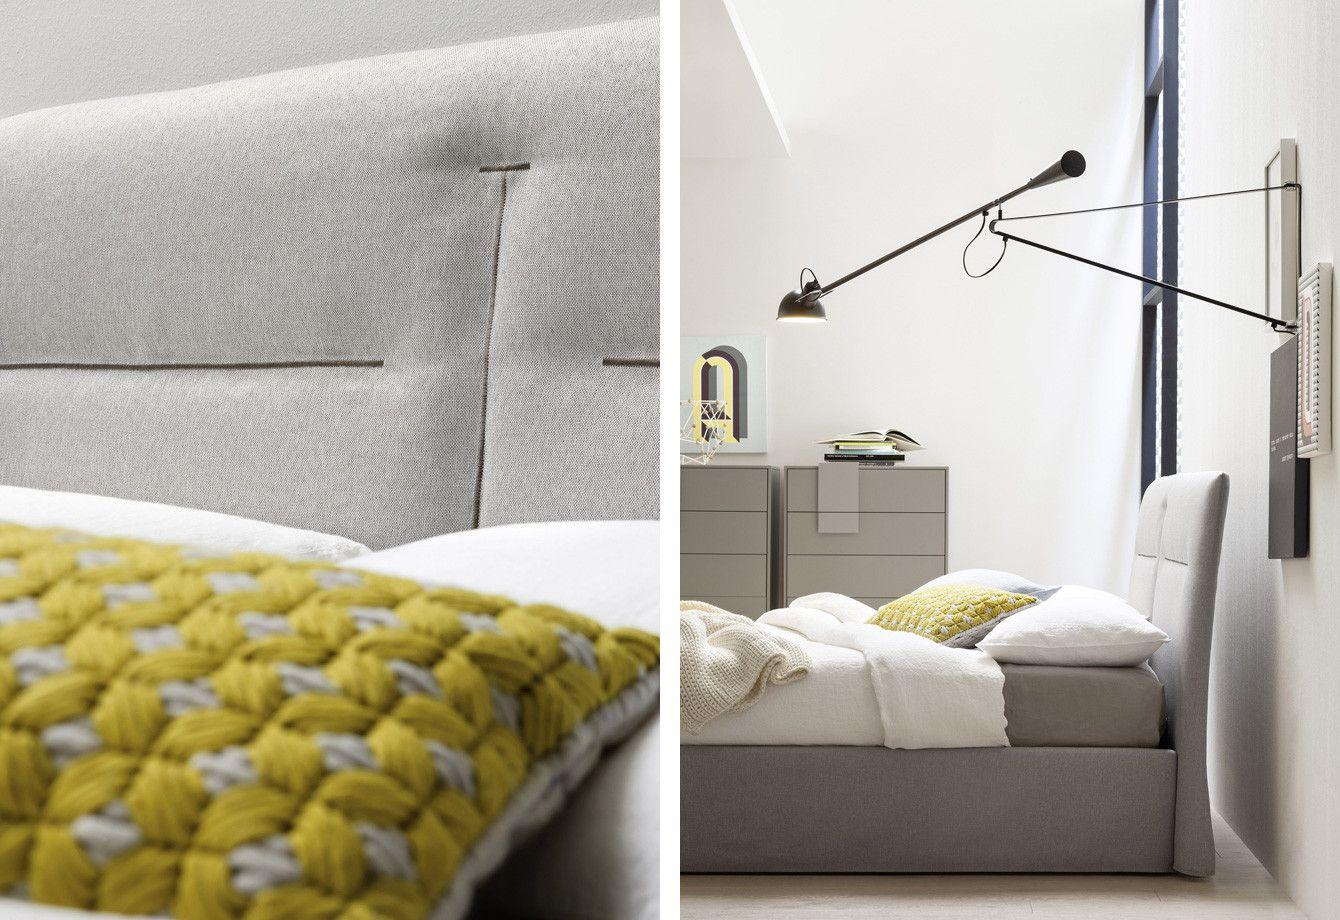 one beds products novamobili design by nova lab edoardo